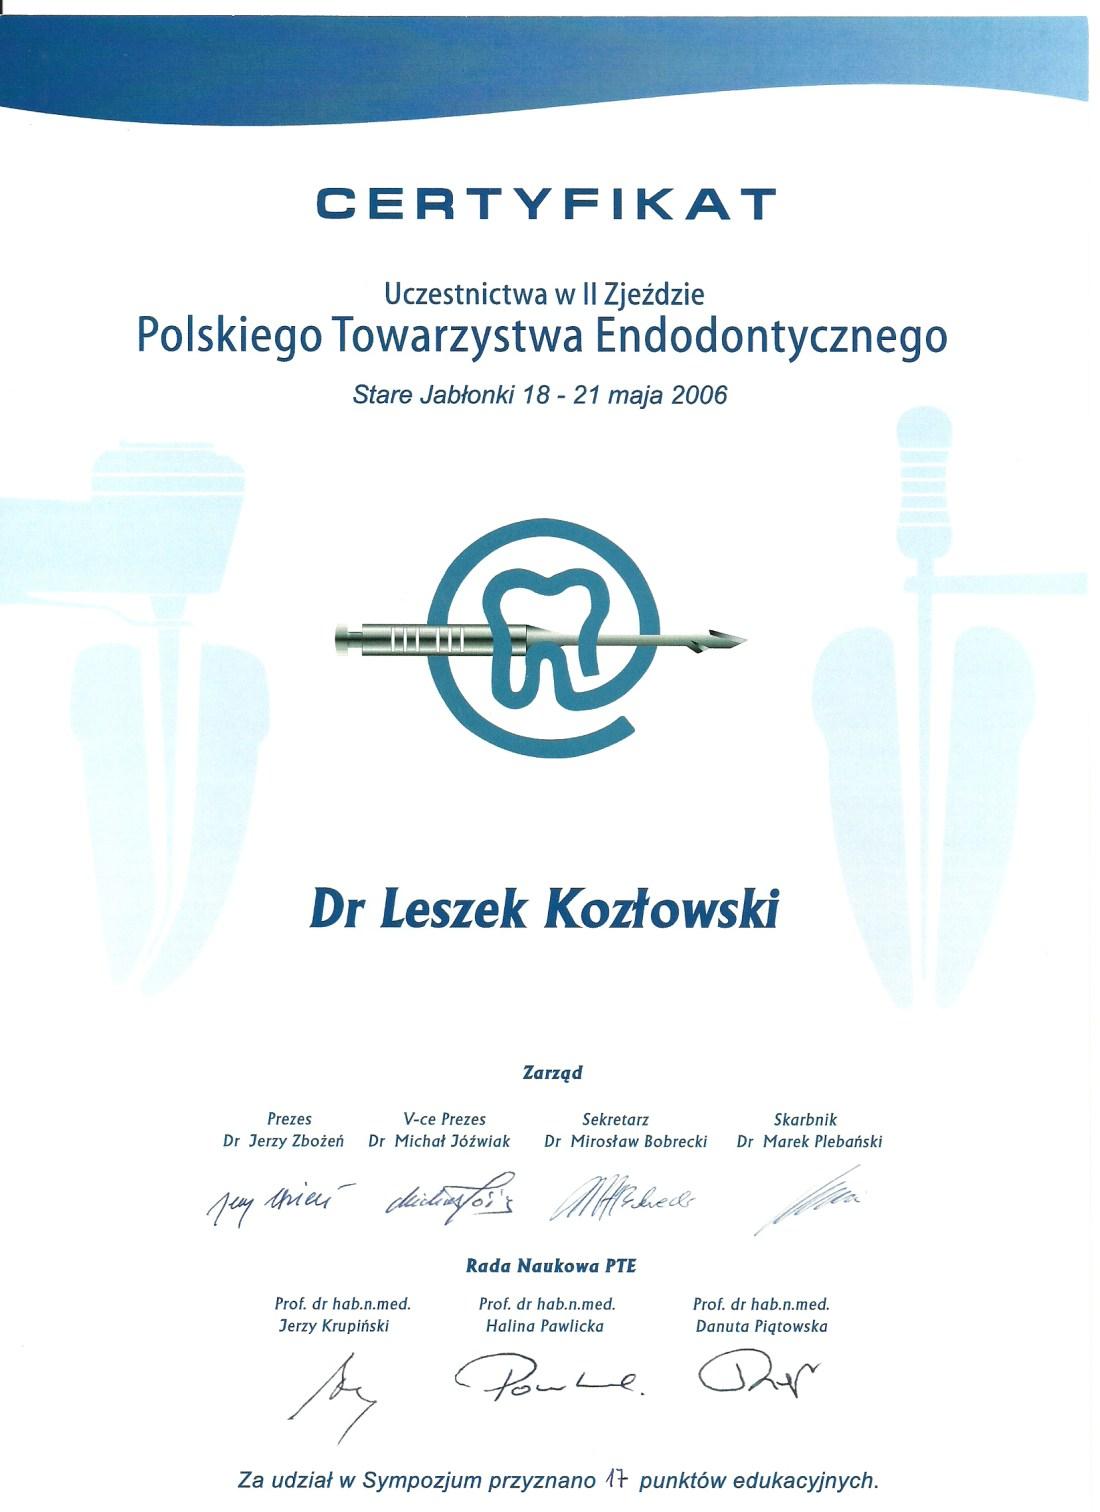 dentysta warszawa DENTYSTA WARSZAWA – DENTOKLINIKA Dentysta warszawa Leszek Kozlowski Certyfikat 5